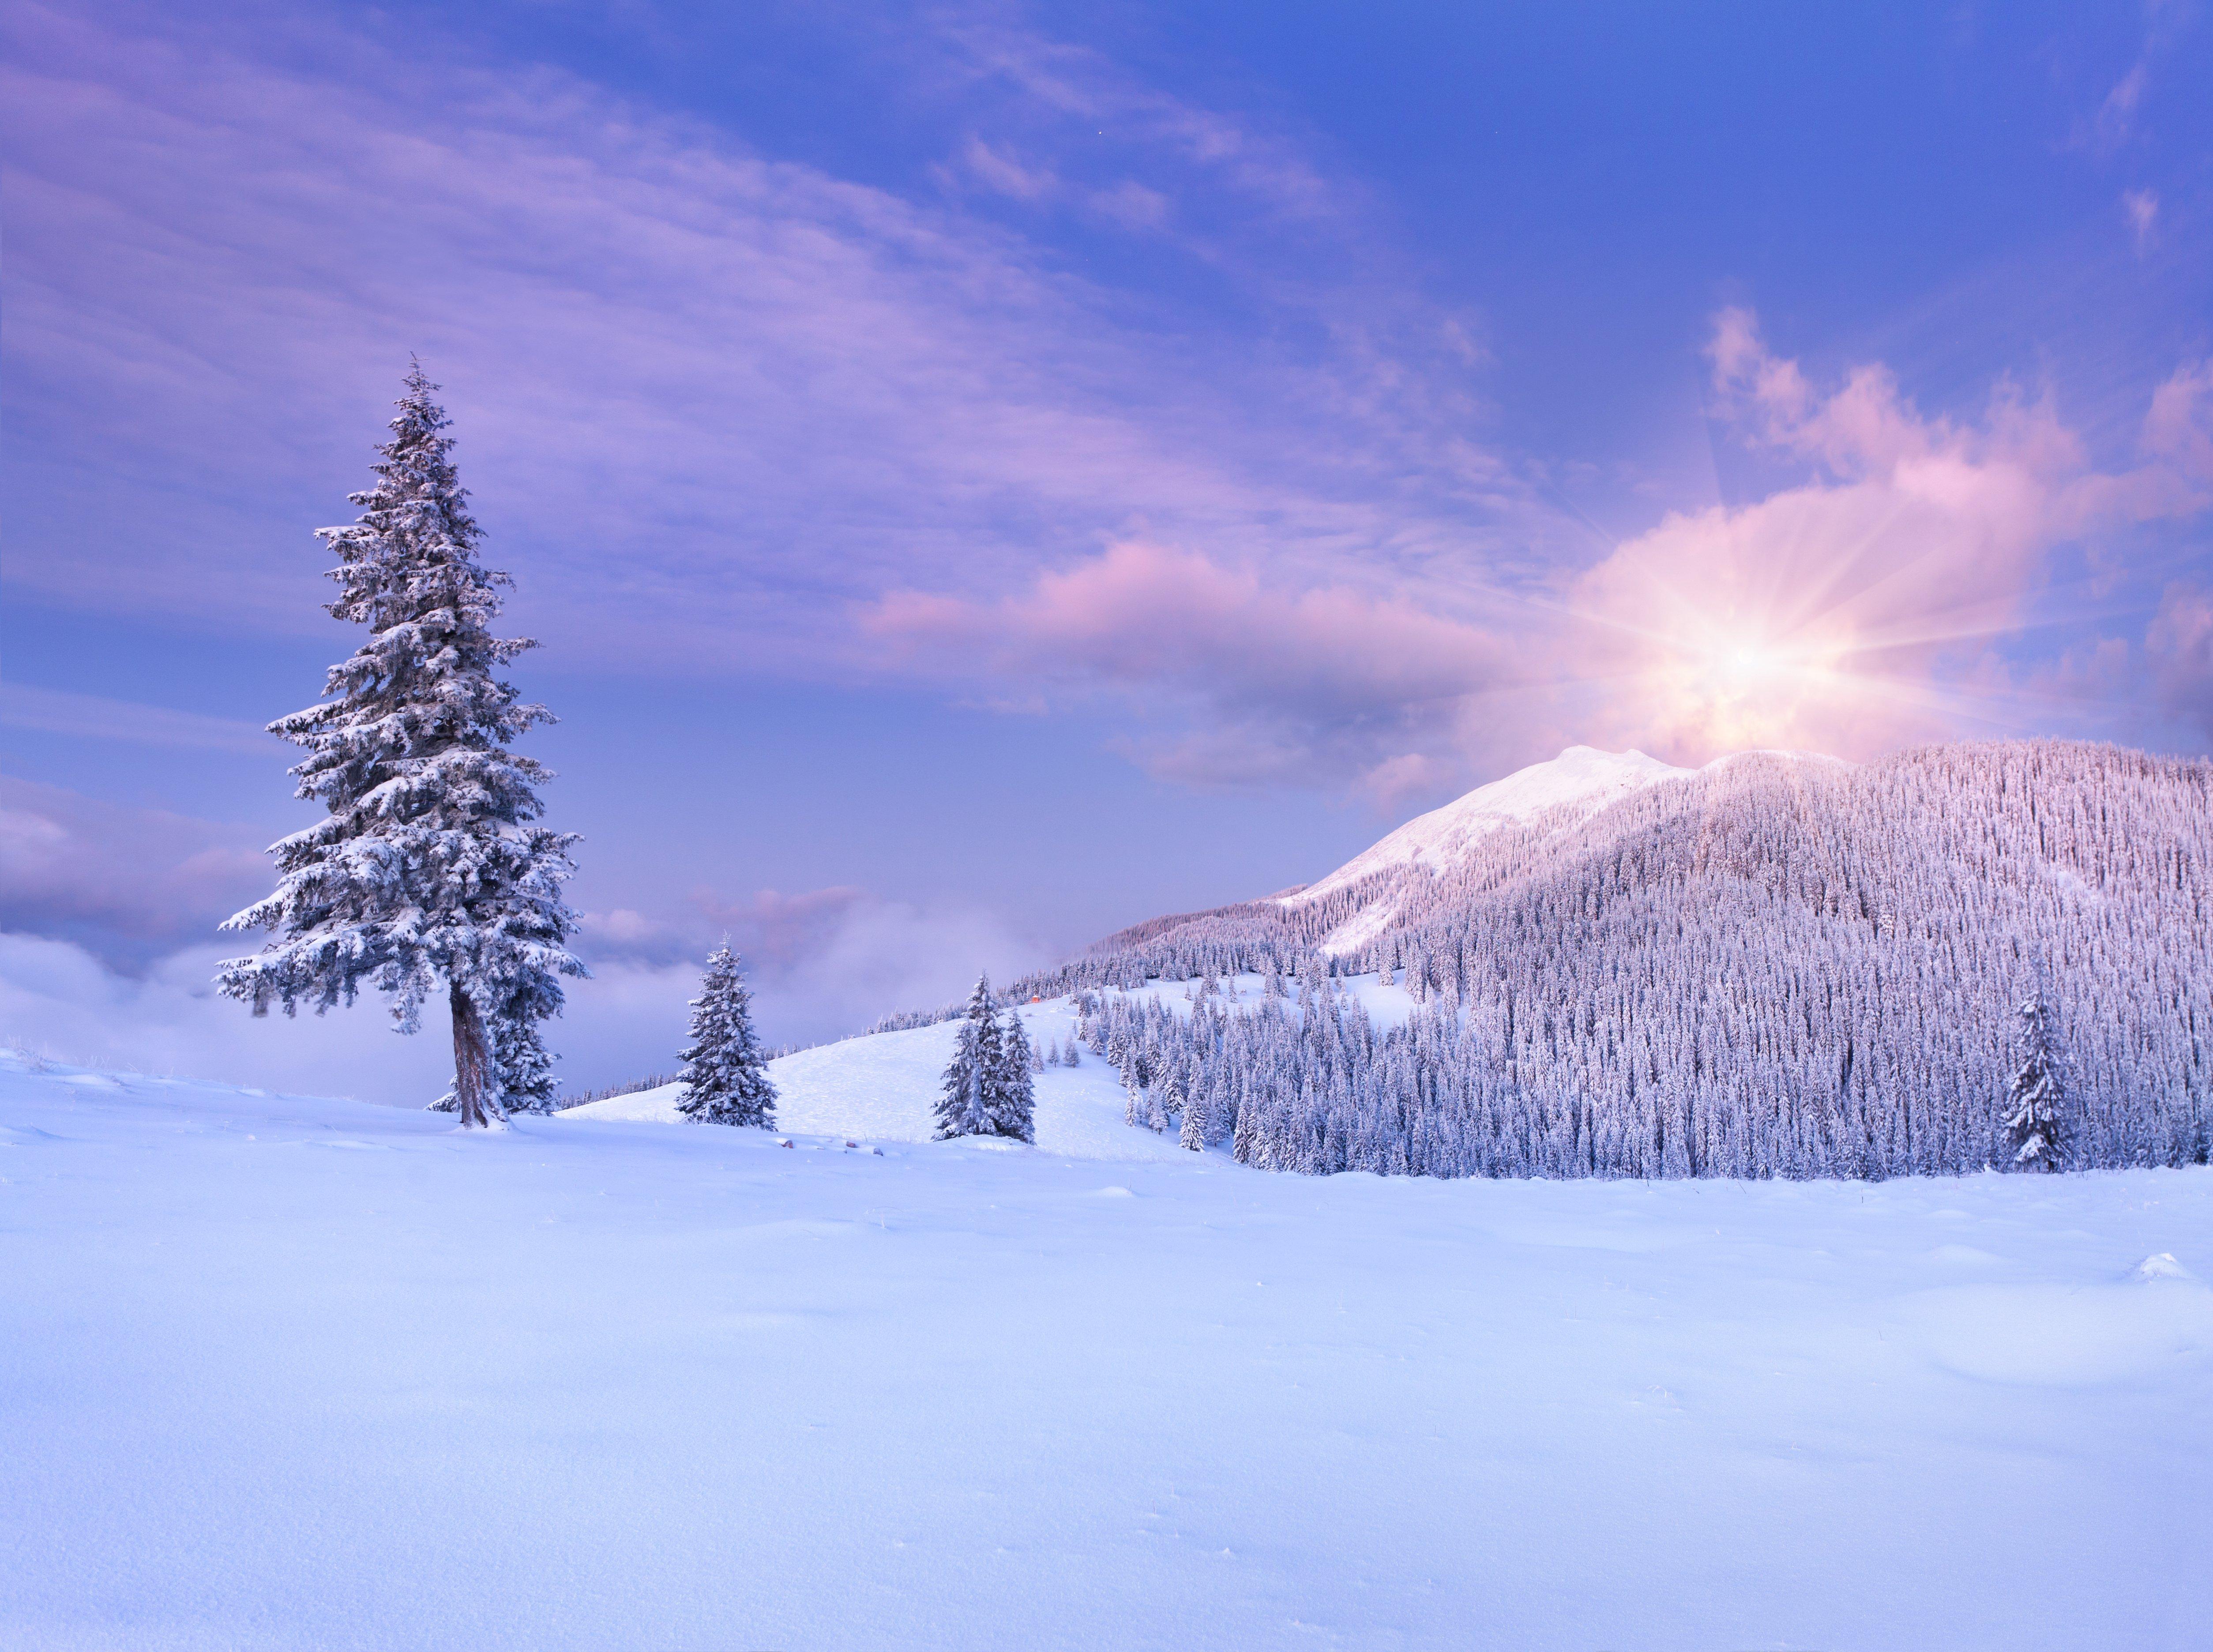 santa sky snow wallpaper - photo #32